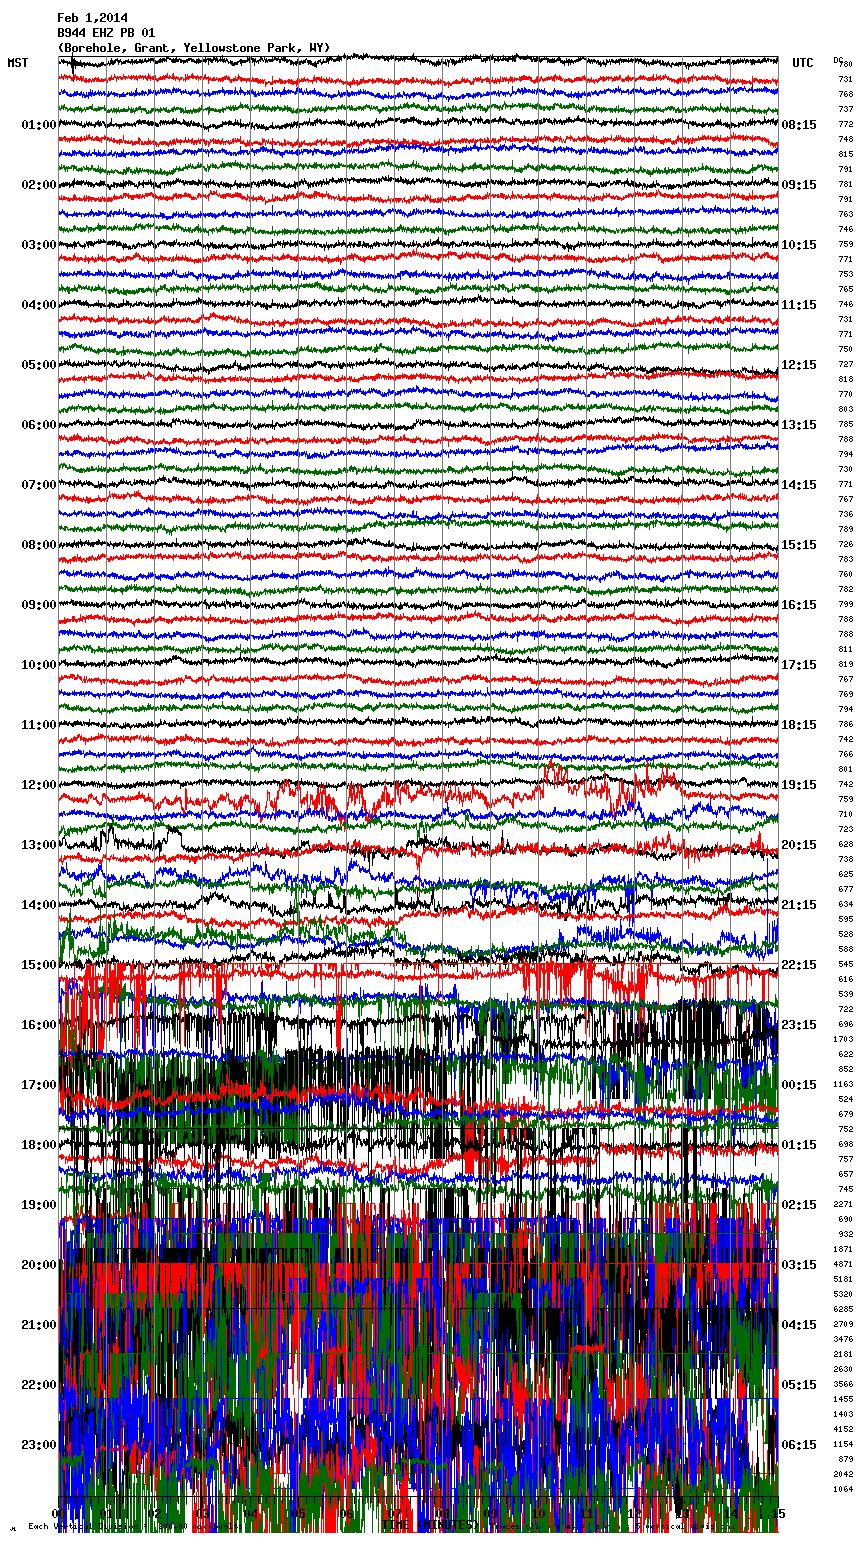 yellowstone earthquake pre